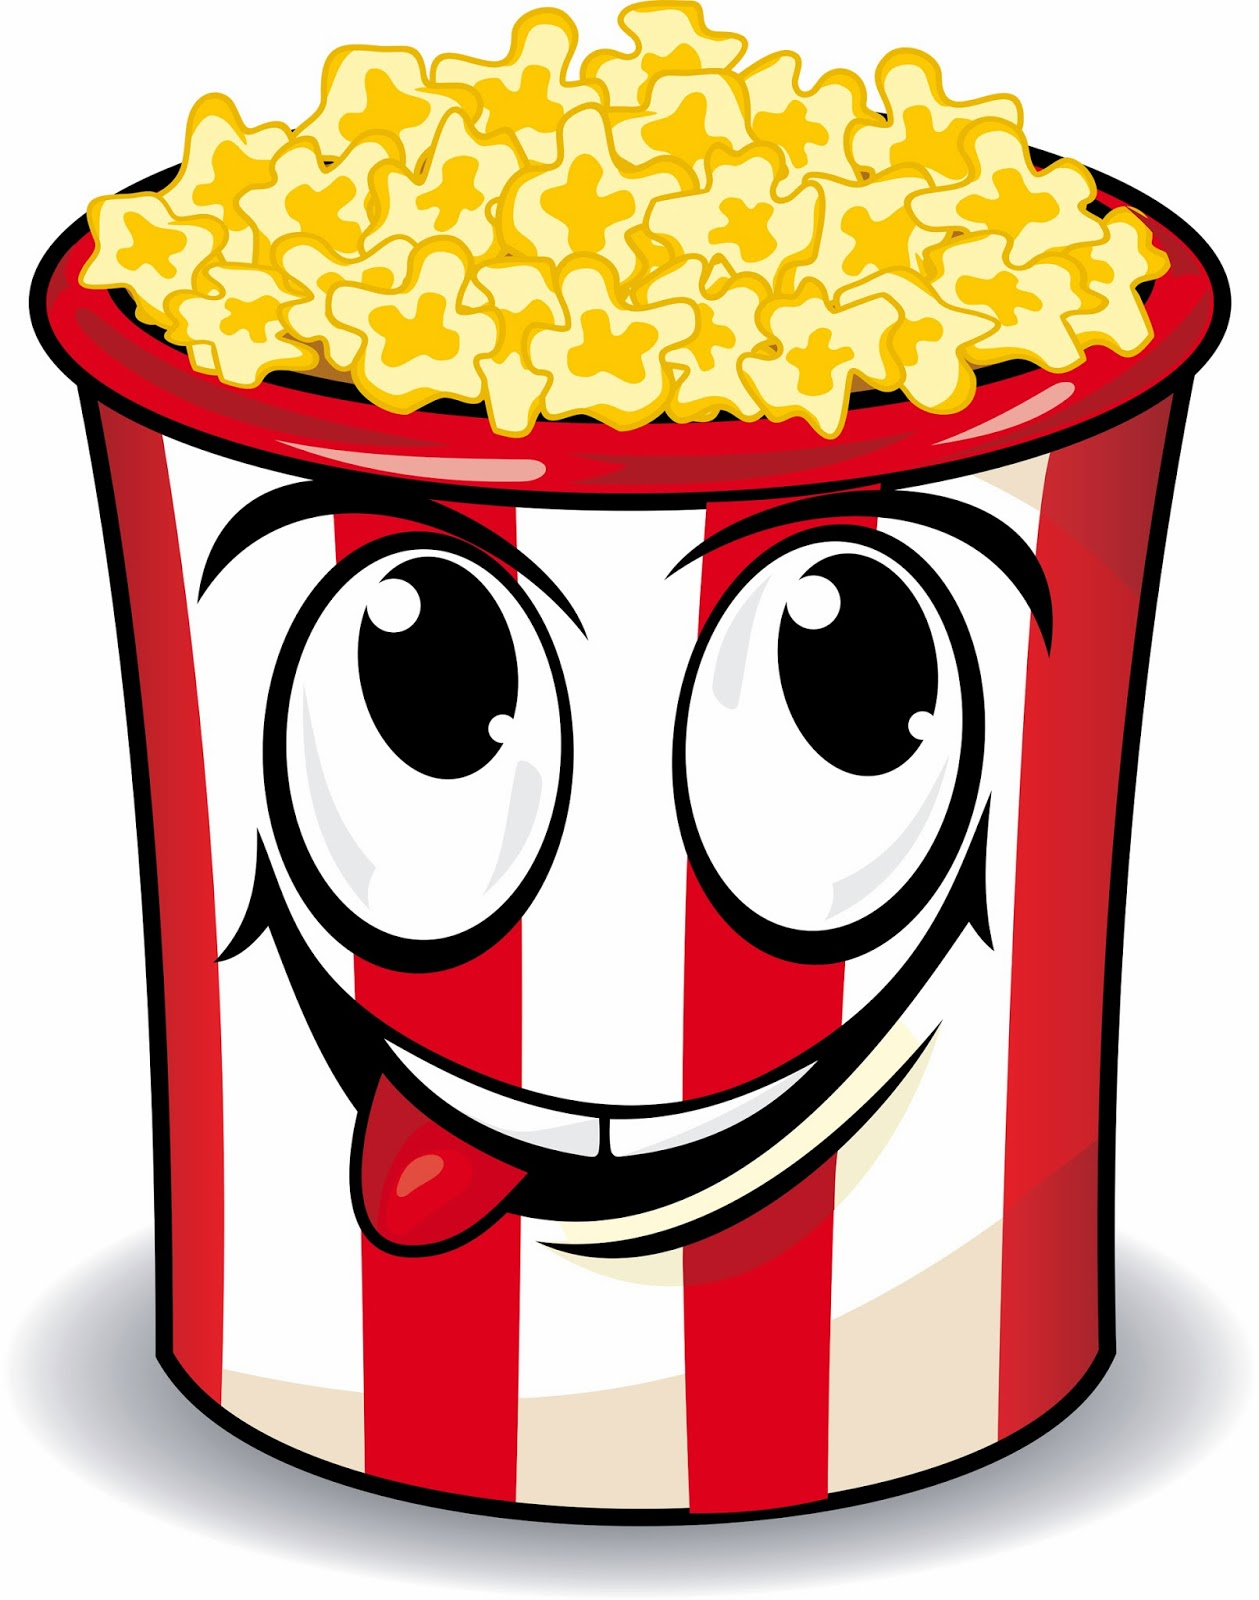 Popcorn Clipart Free Clip Art Images Ima-Popcorn clipart free clip art images image 2-17